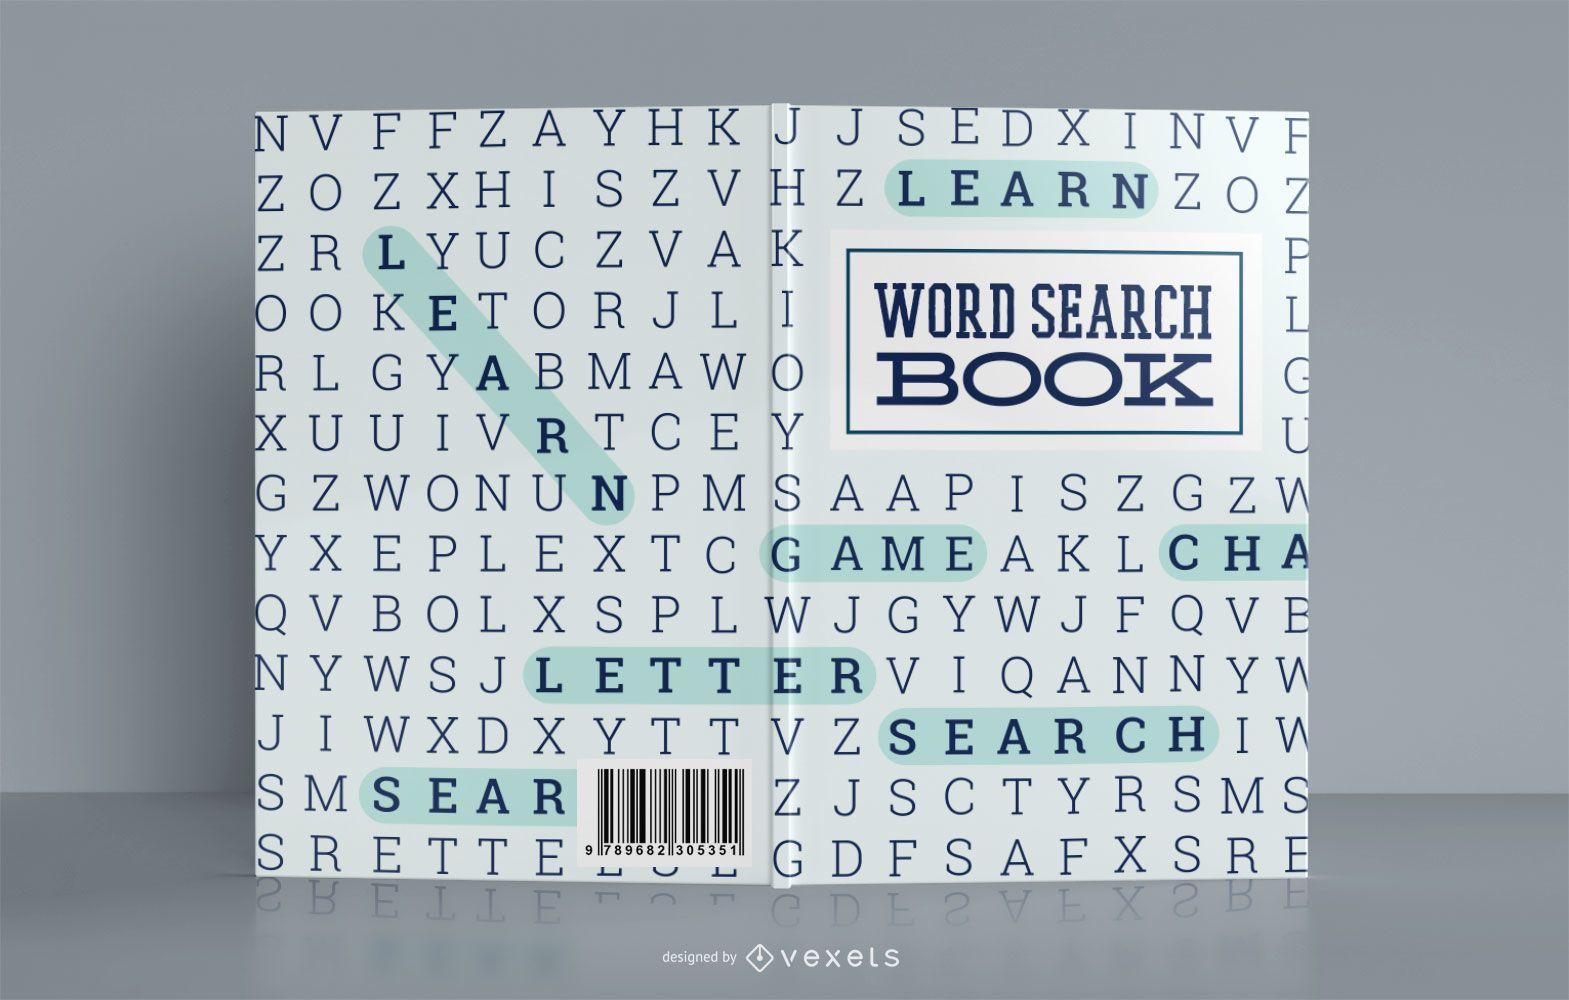 Word Search Book Cover Design